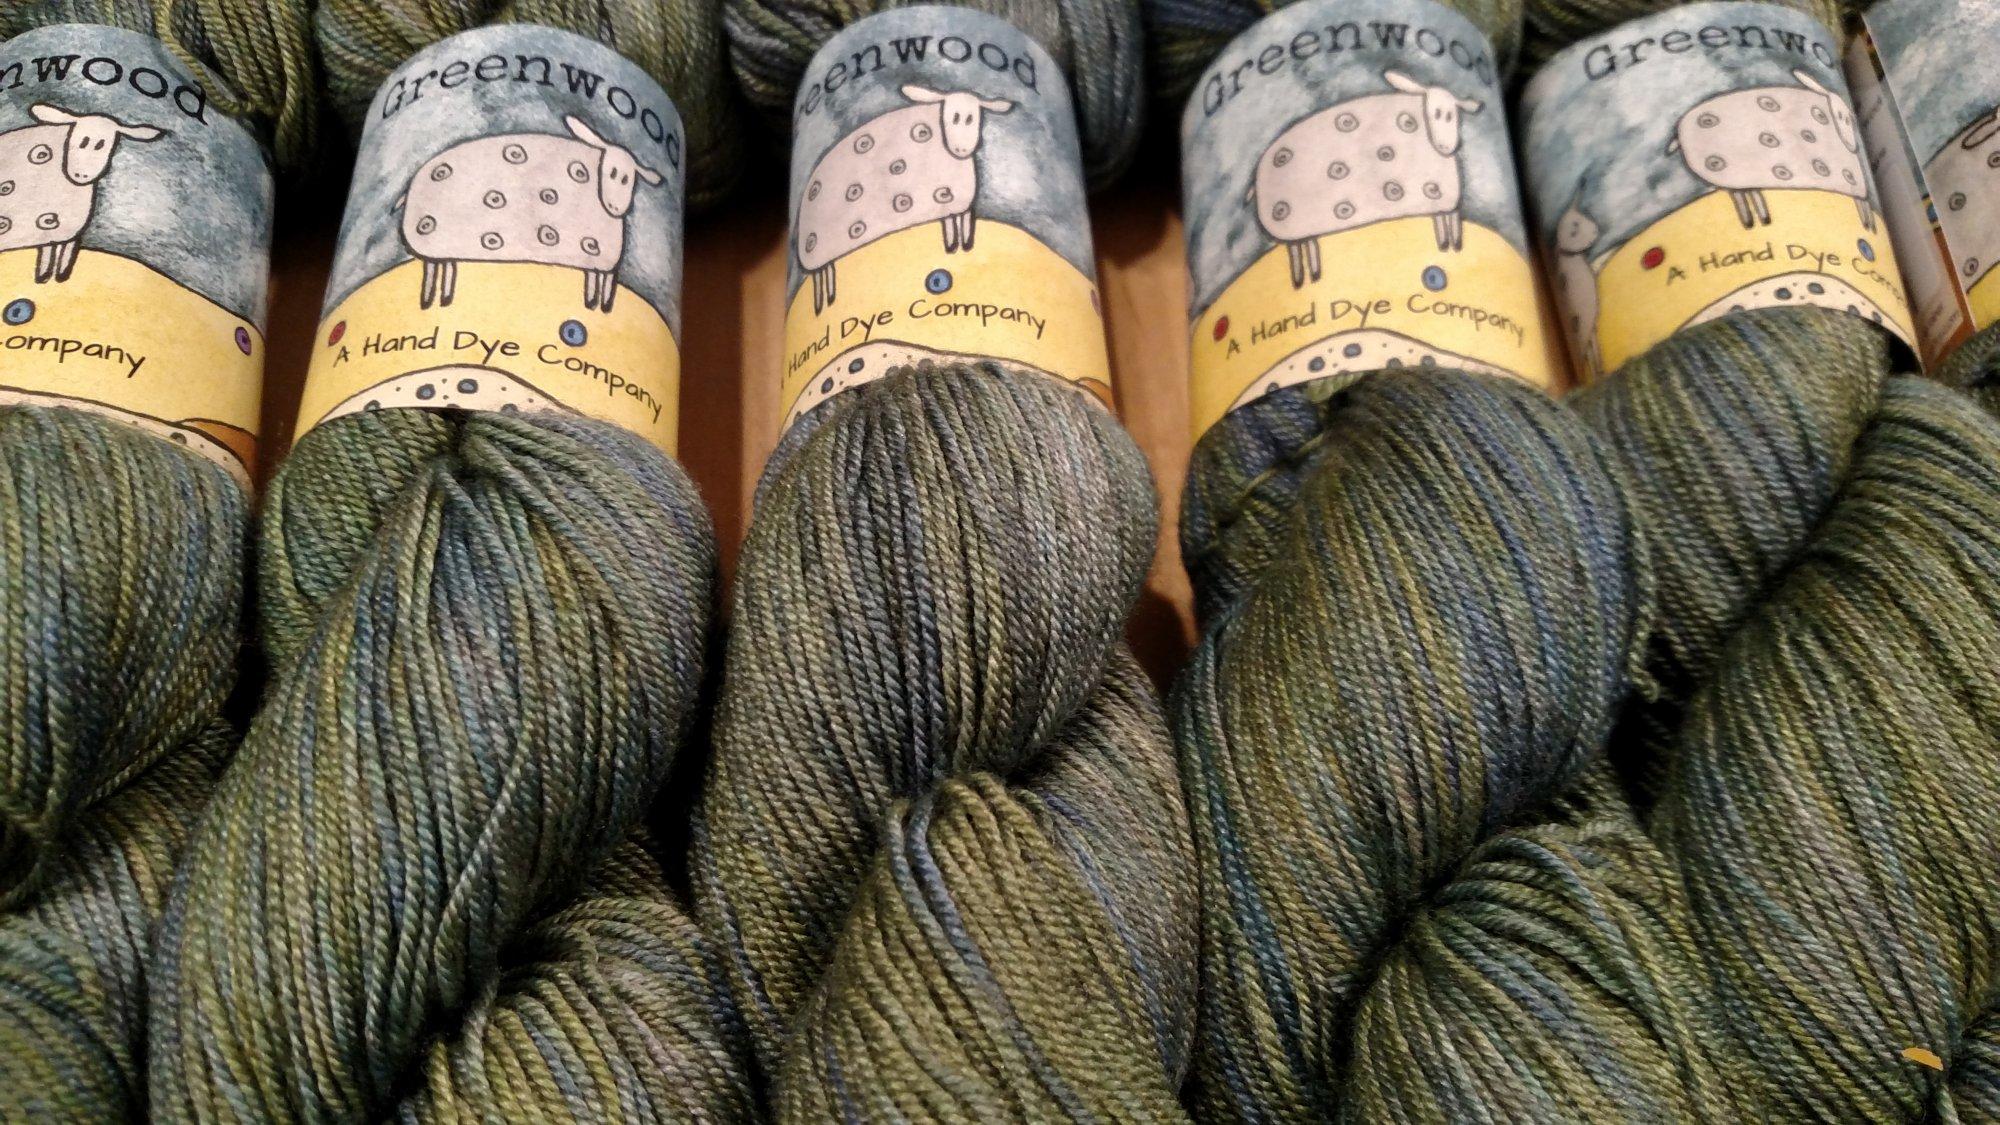 Greenwood Fiberworks Yakity Yak - Seaglass variegated